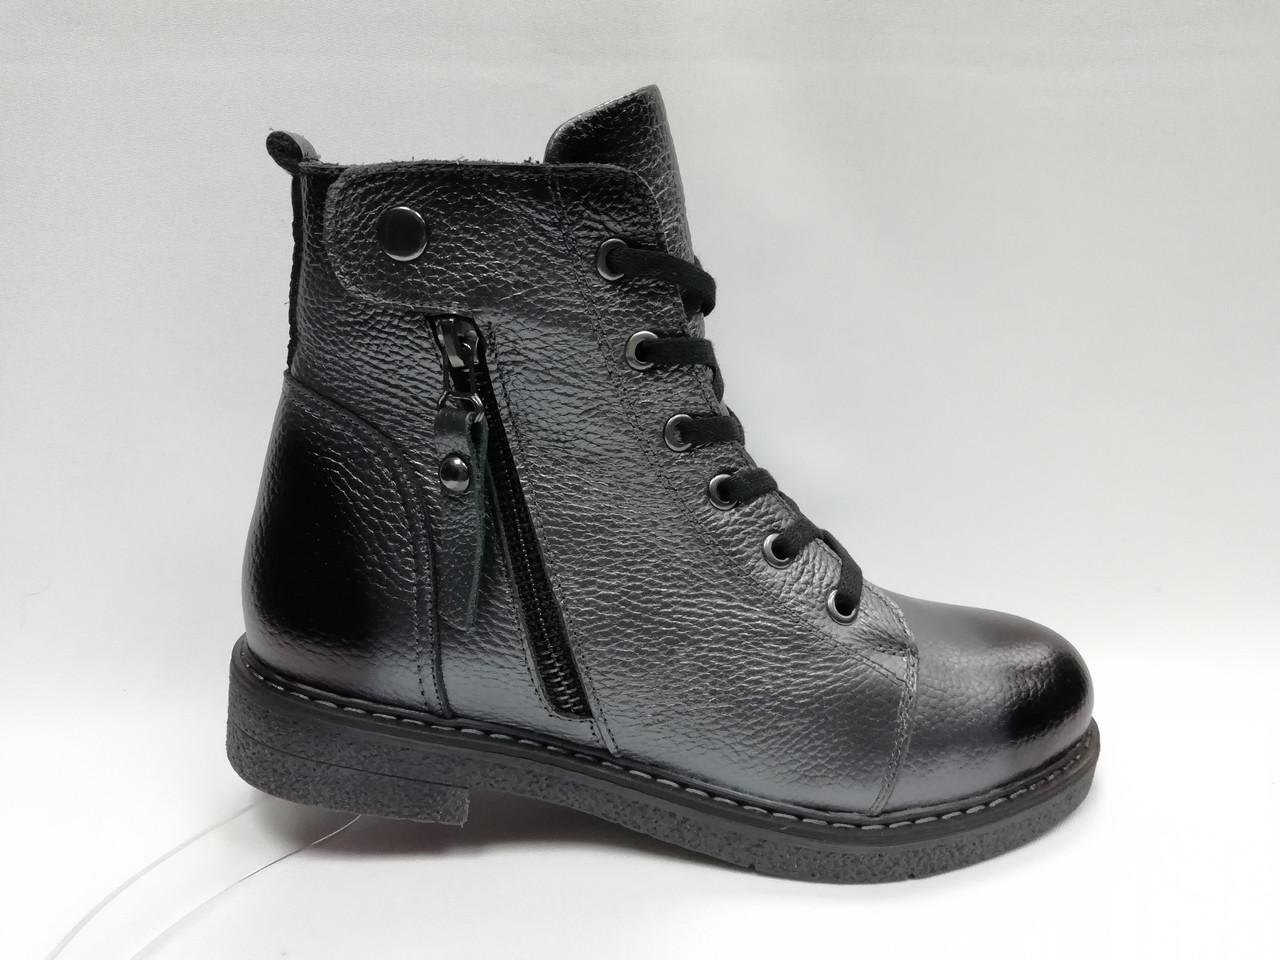 Зимние ботиночки на толстой подошве  со  шнурками и  молнией. Турция.